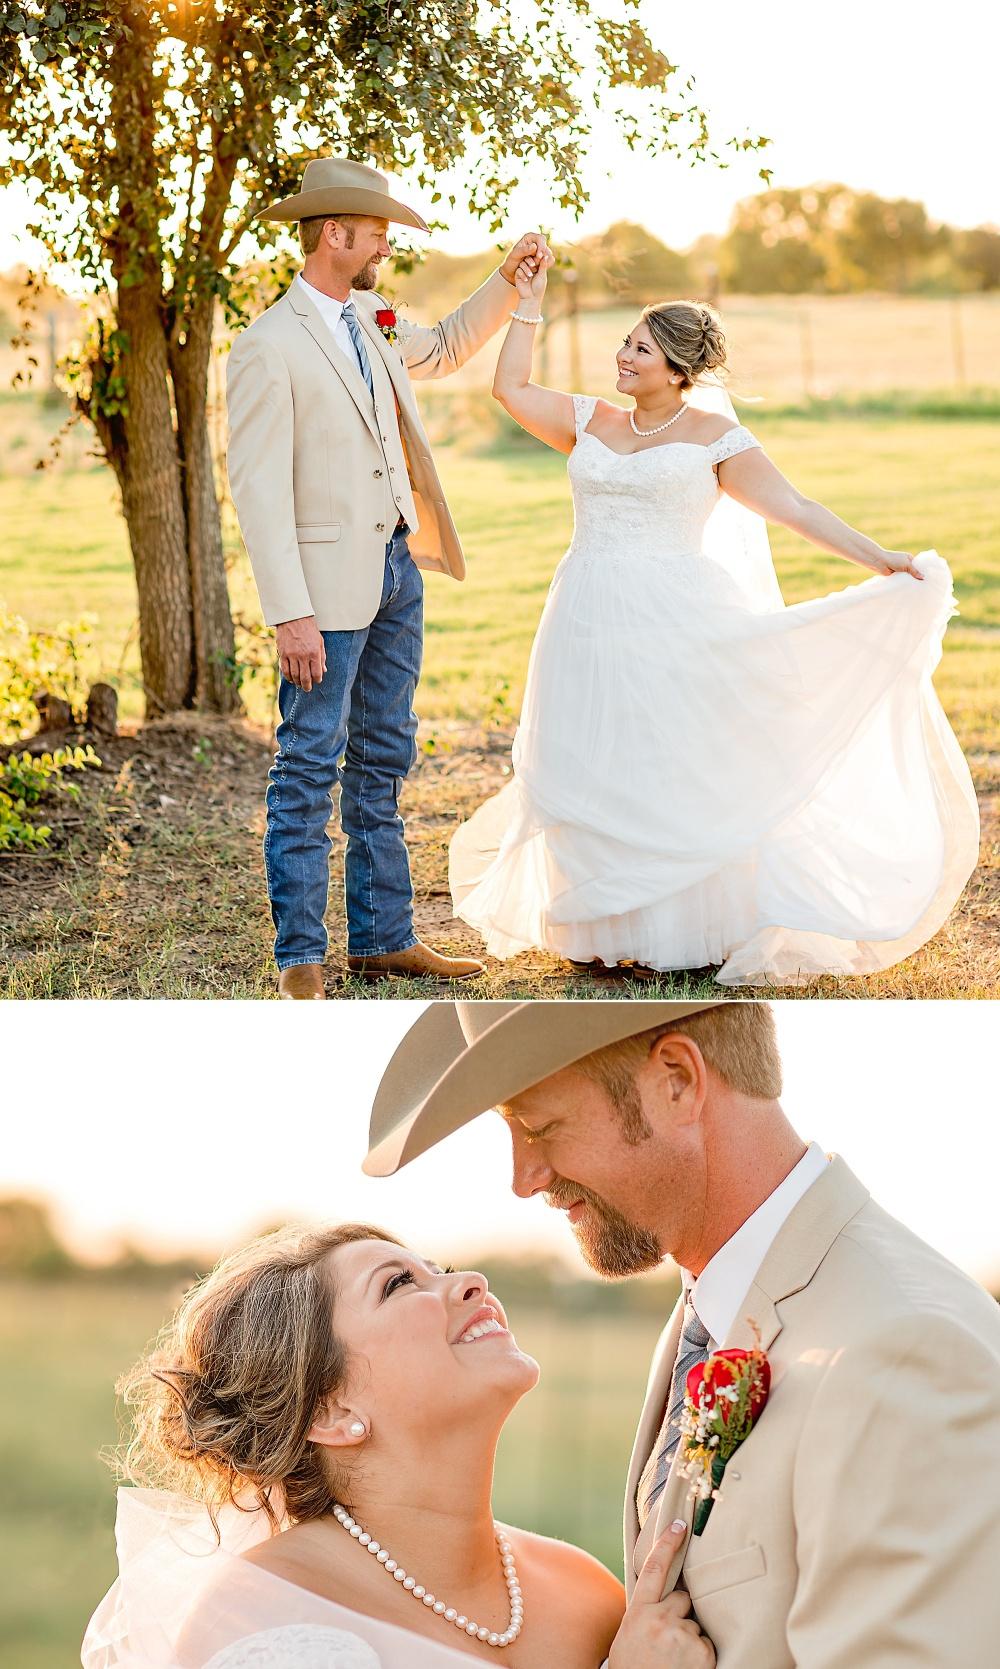 Wedding-Photographer-Rustic-Sunflower-theme-Texas-Carly-Barton-Photography_0117.jpg